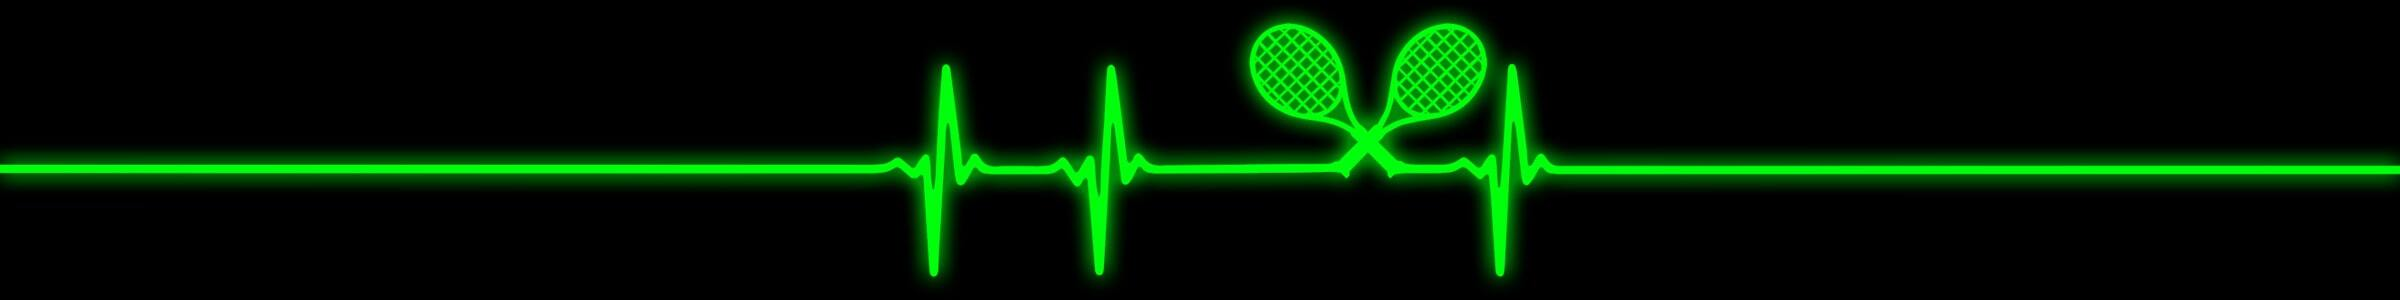 Tennis_2400x300